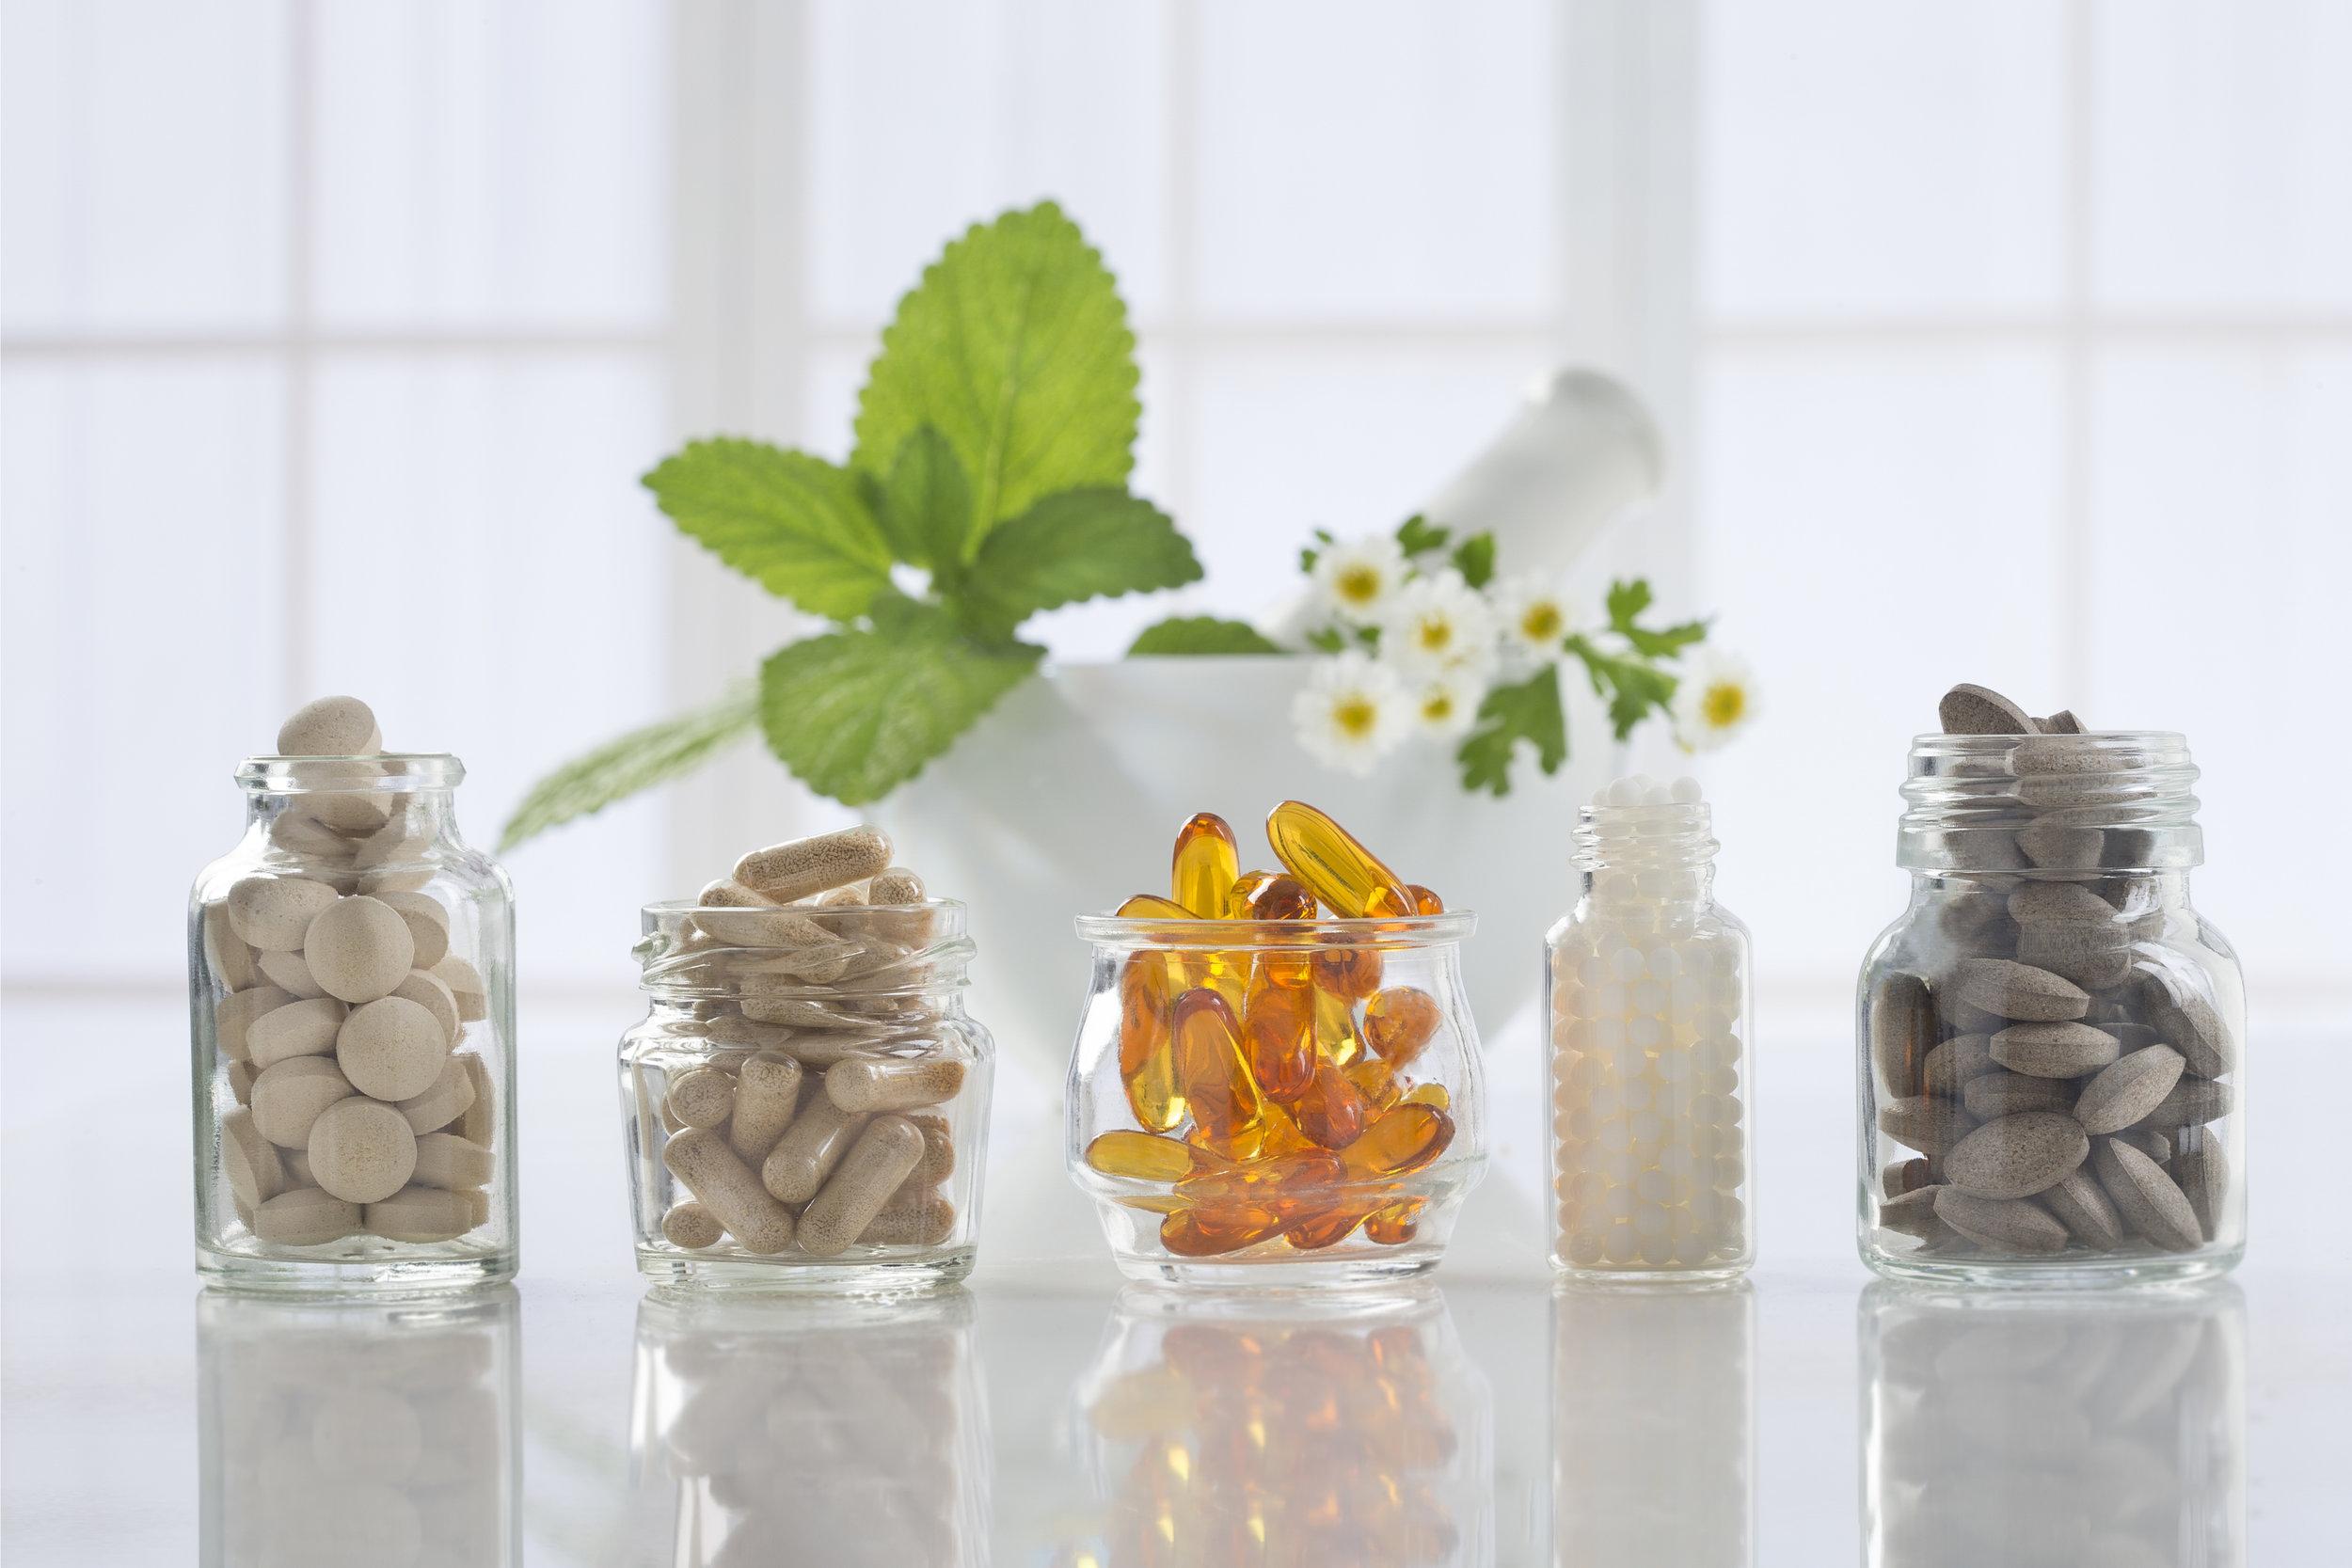 genetics based supplements